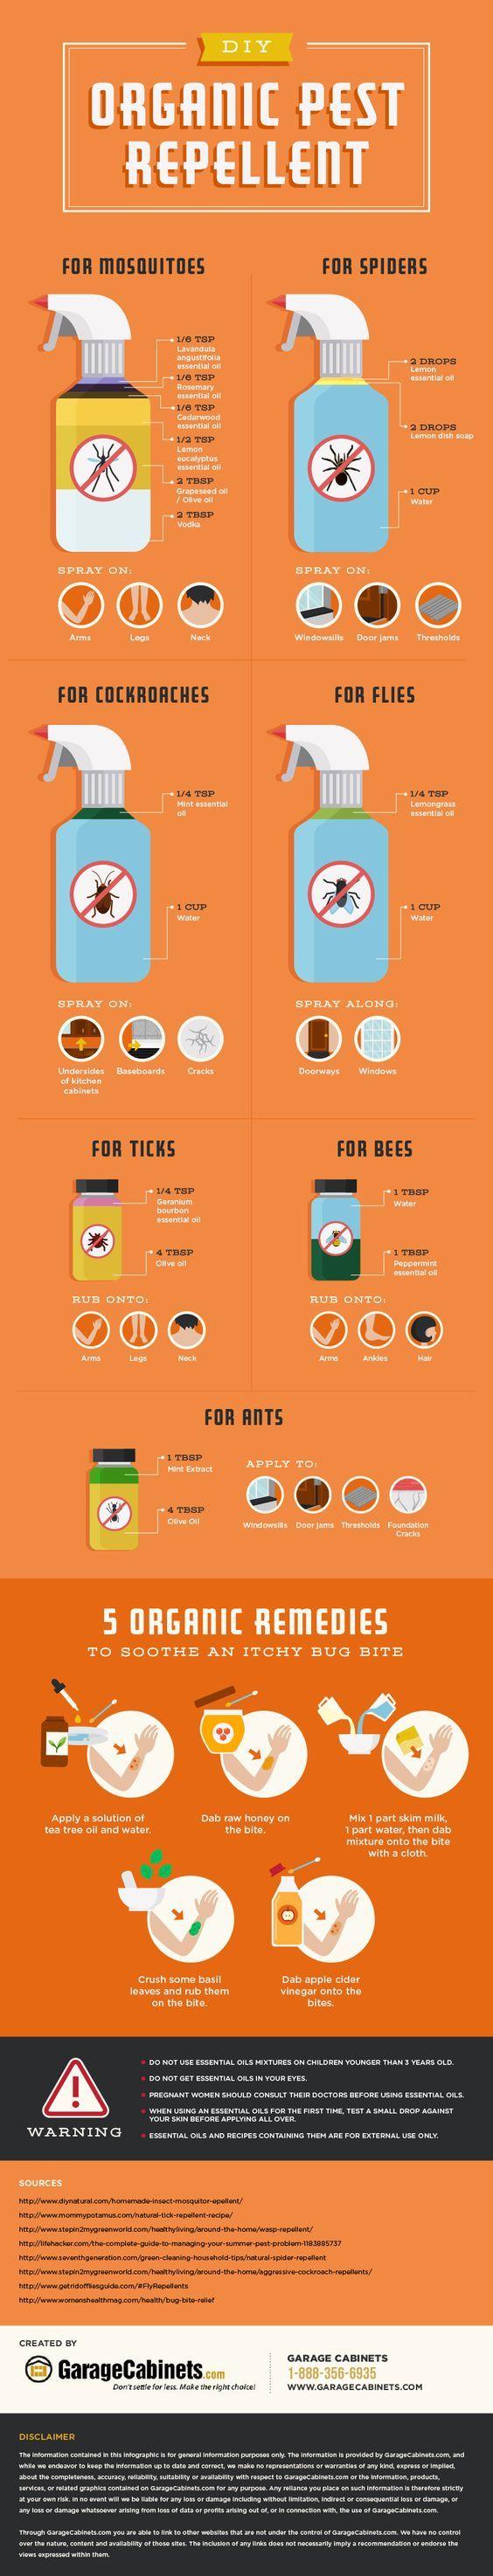 Organic Pest Control Chart - no link